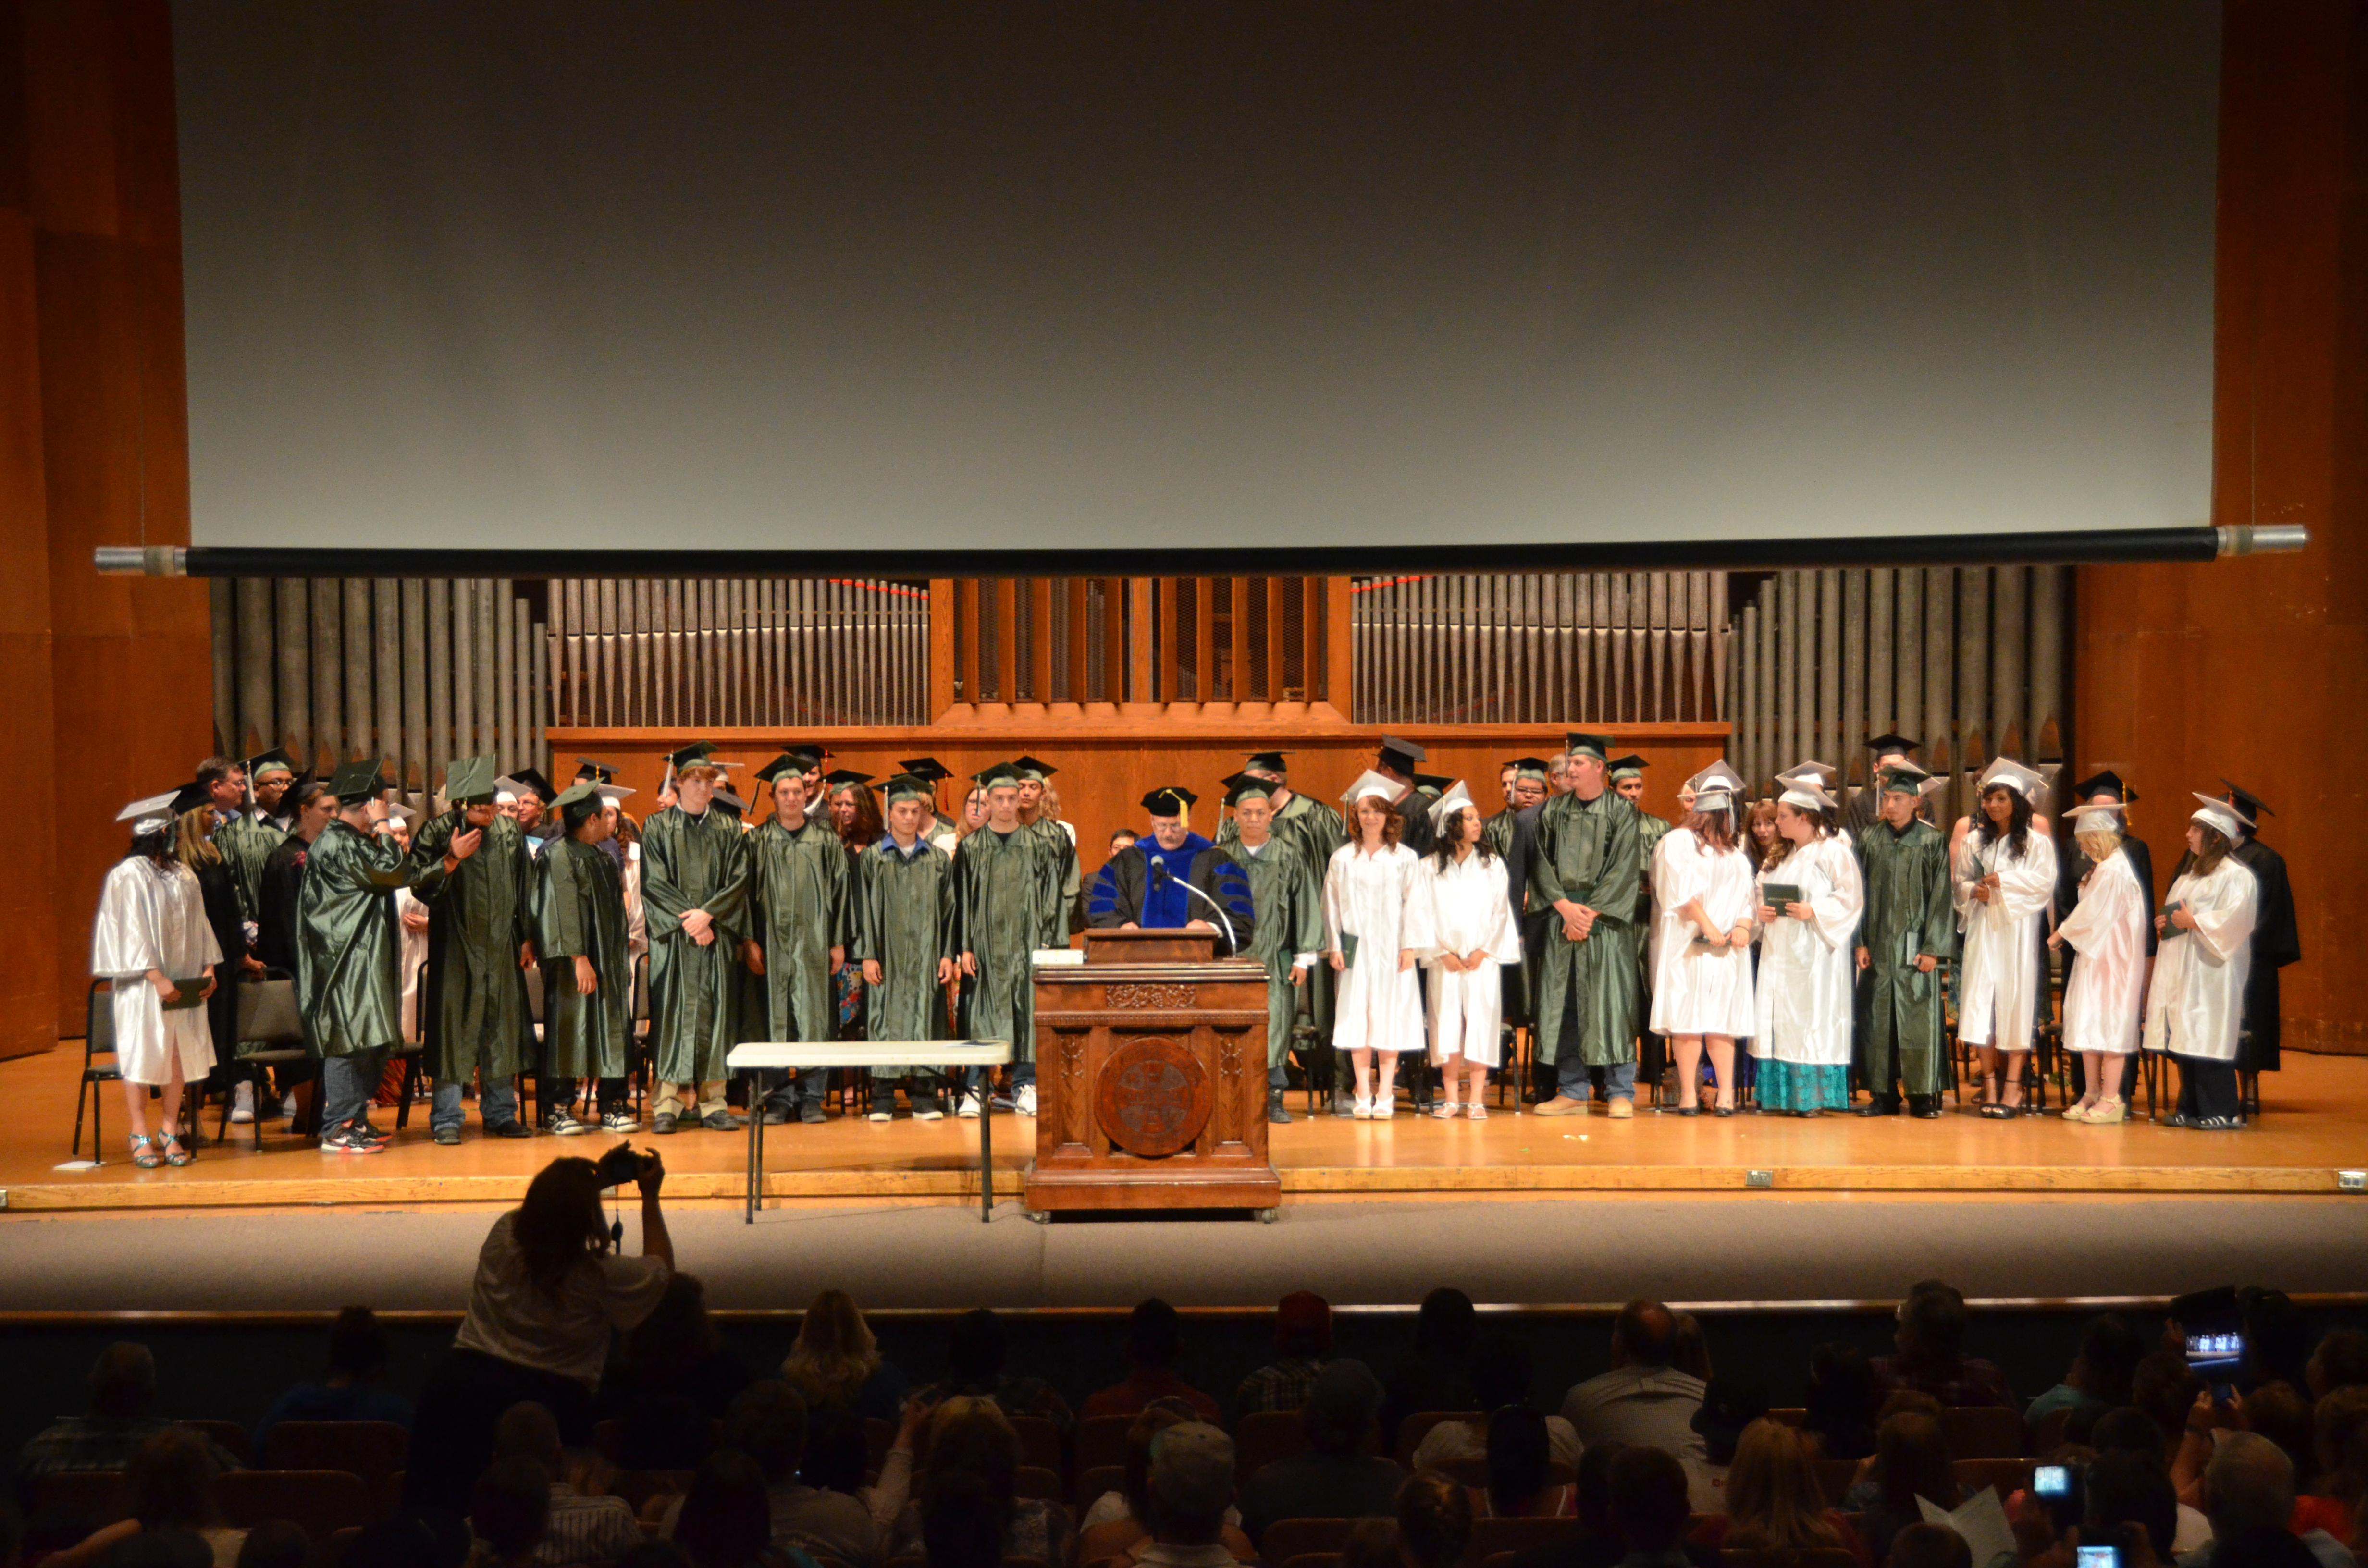 Graduating class of 2013